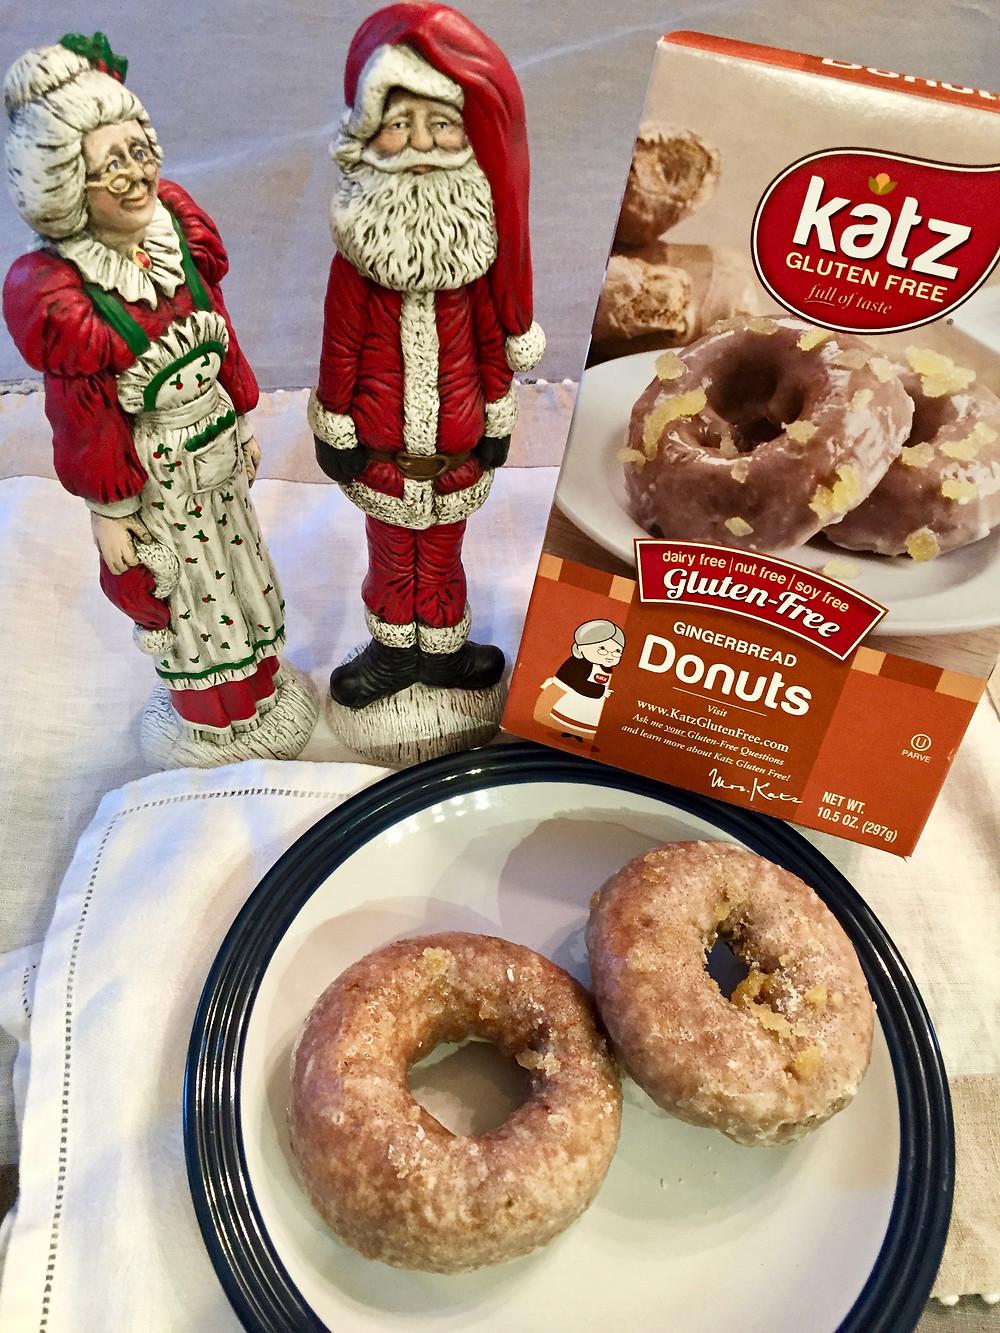 katz gingerbread doughnuts, katz gf gingerbread doughnuts, gluten free katz doughnuts